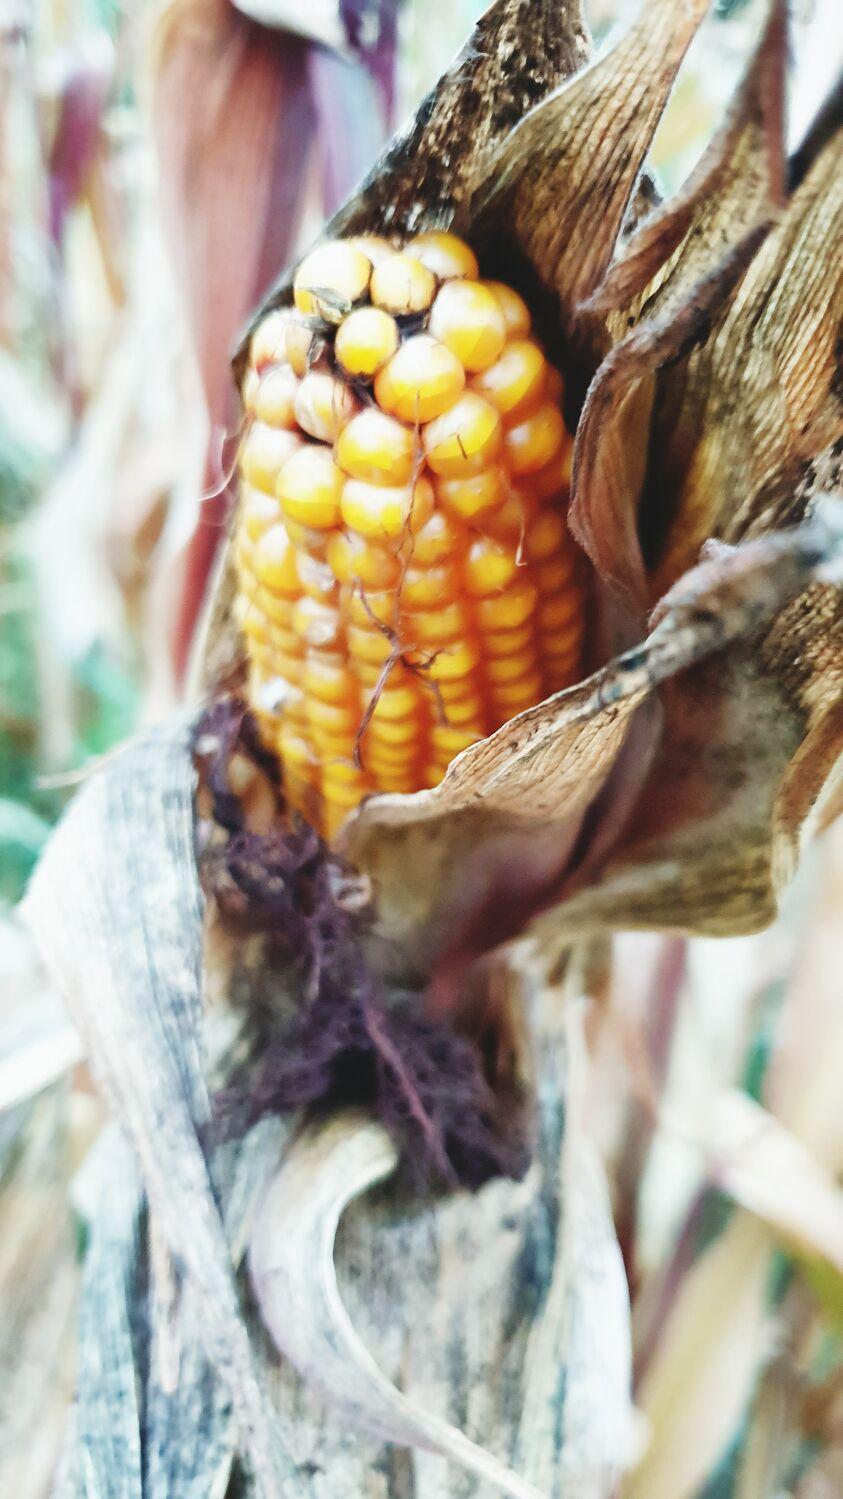 Bild mit Mais, Maiskolben, Erntezeit, Maisfeld, maispflanzen